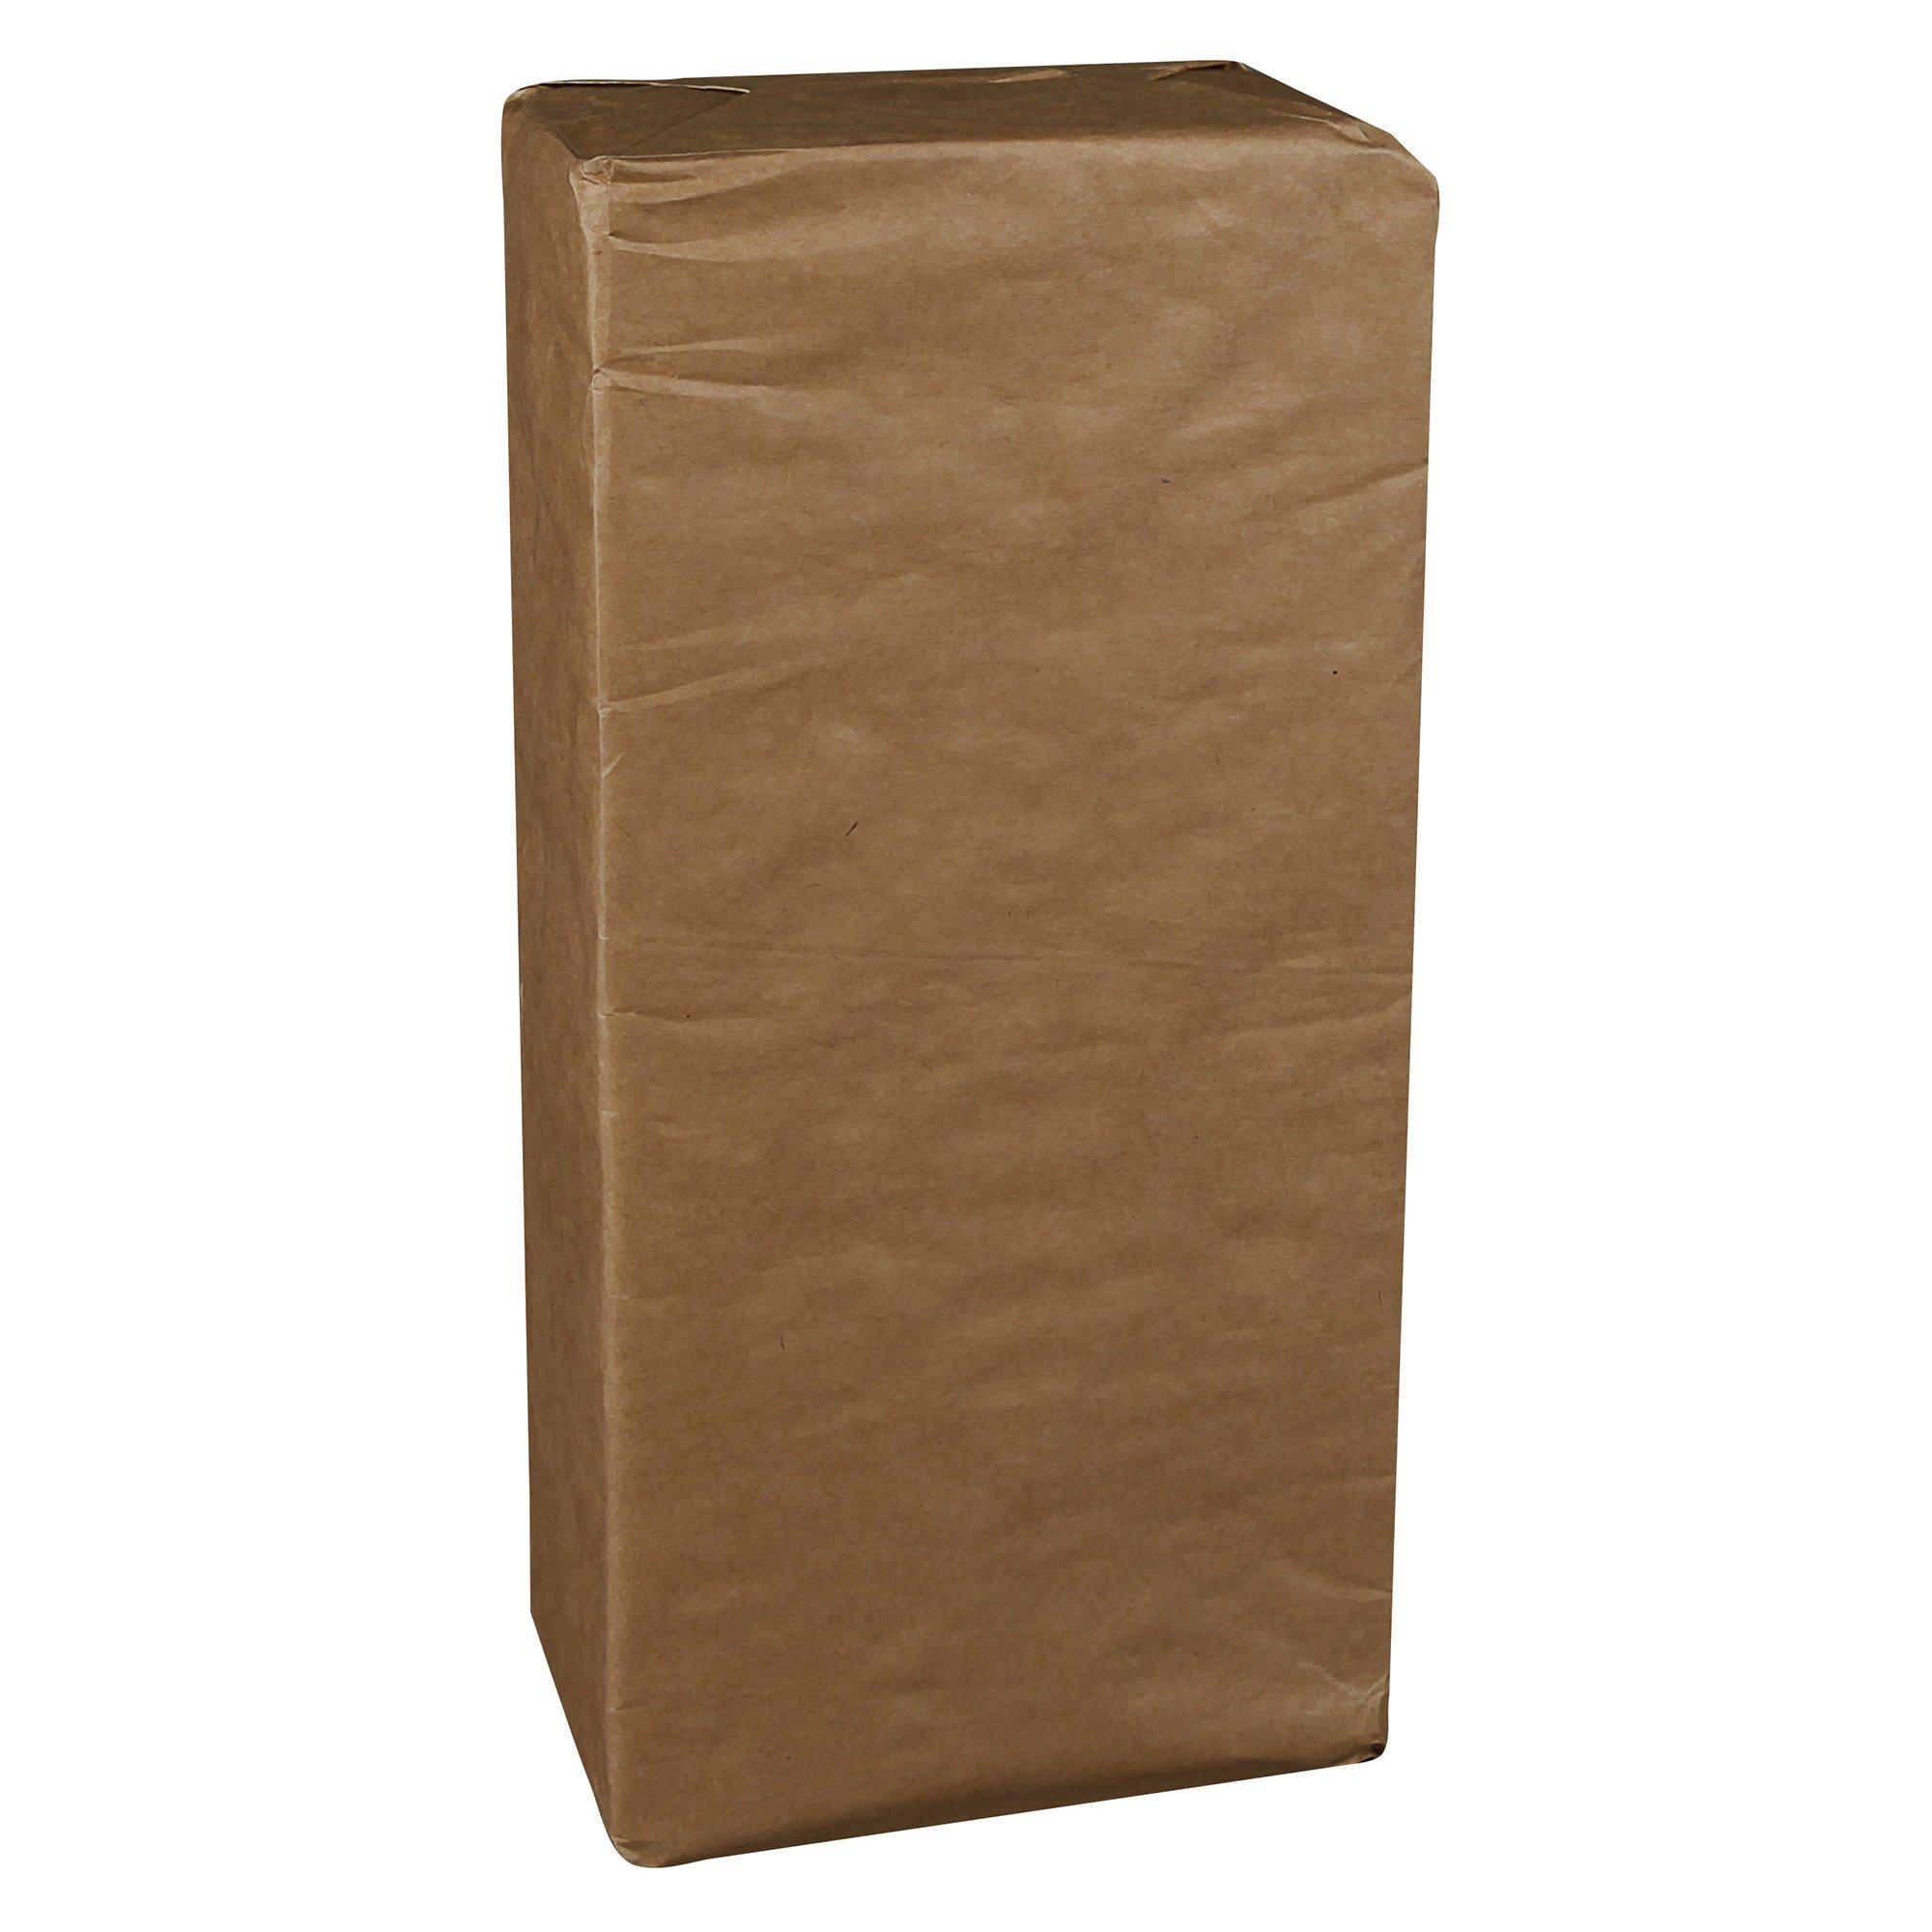 KimberlyClark Professional 98200 Scott 1/8 Fold Dinner Napkins 2 Ply White by Kimberly-Clark Professional